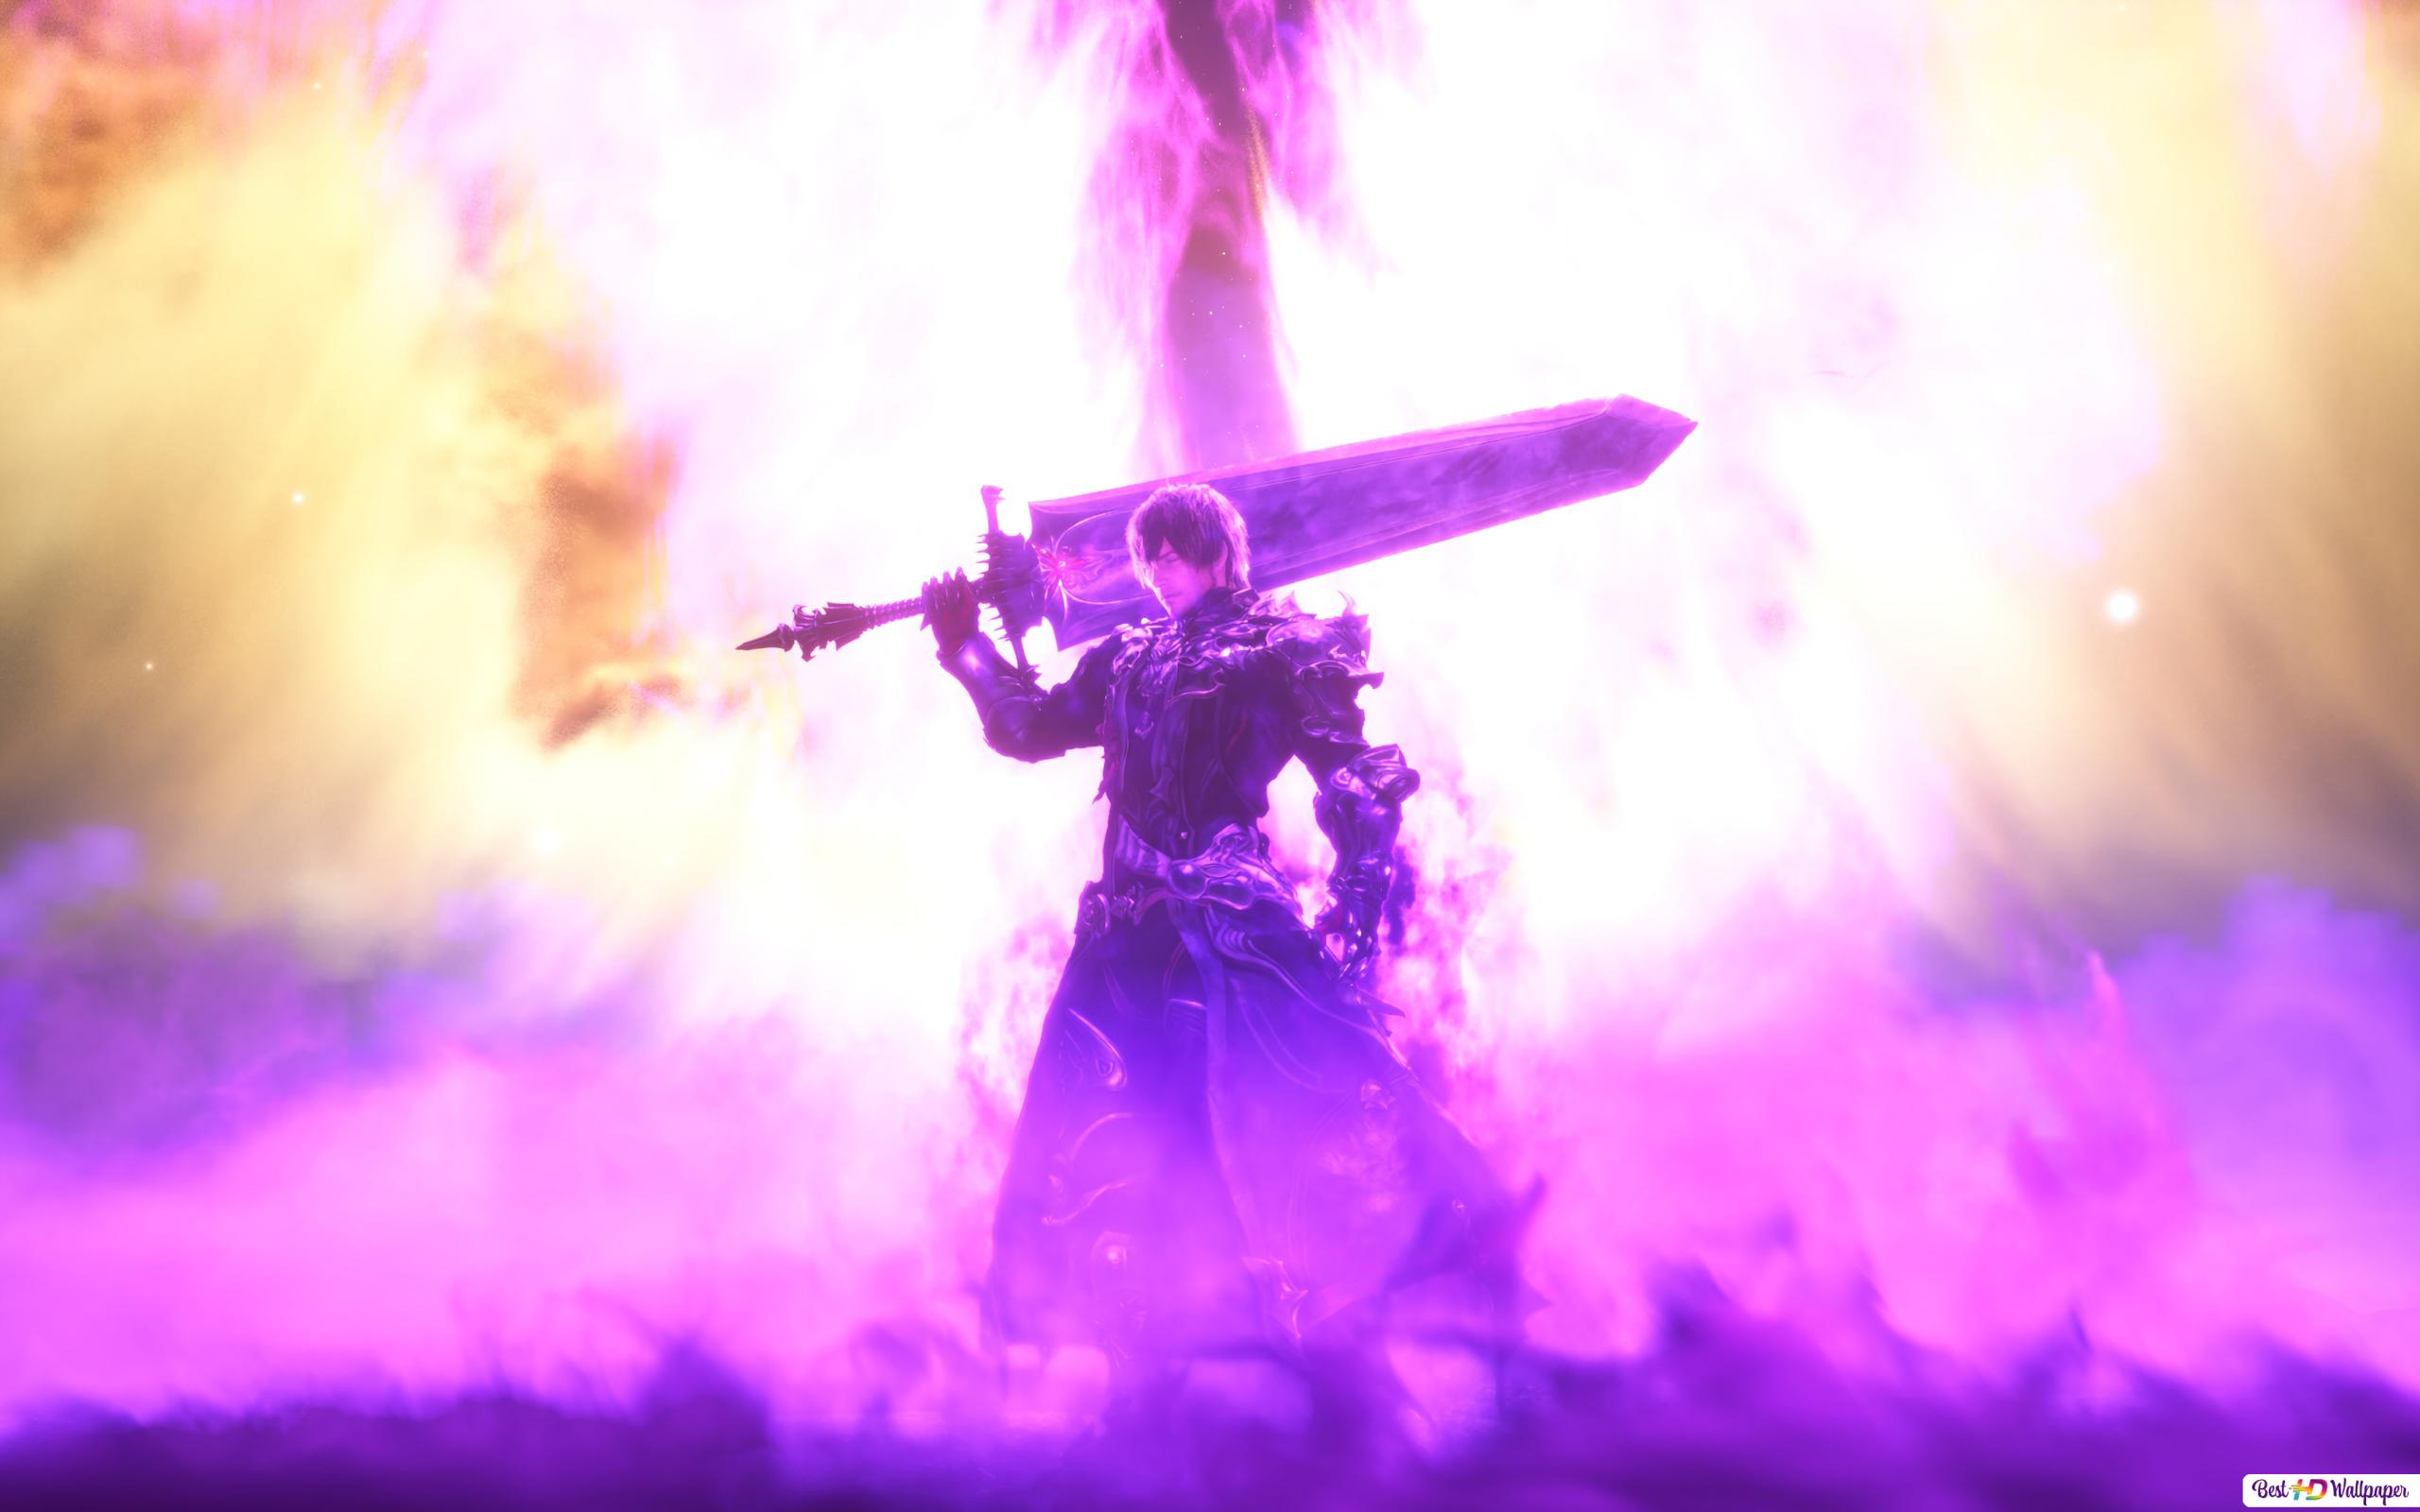 Final Fantasy Xiv Wallpaper 4k Ardusat Org